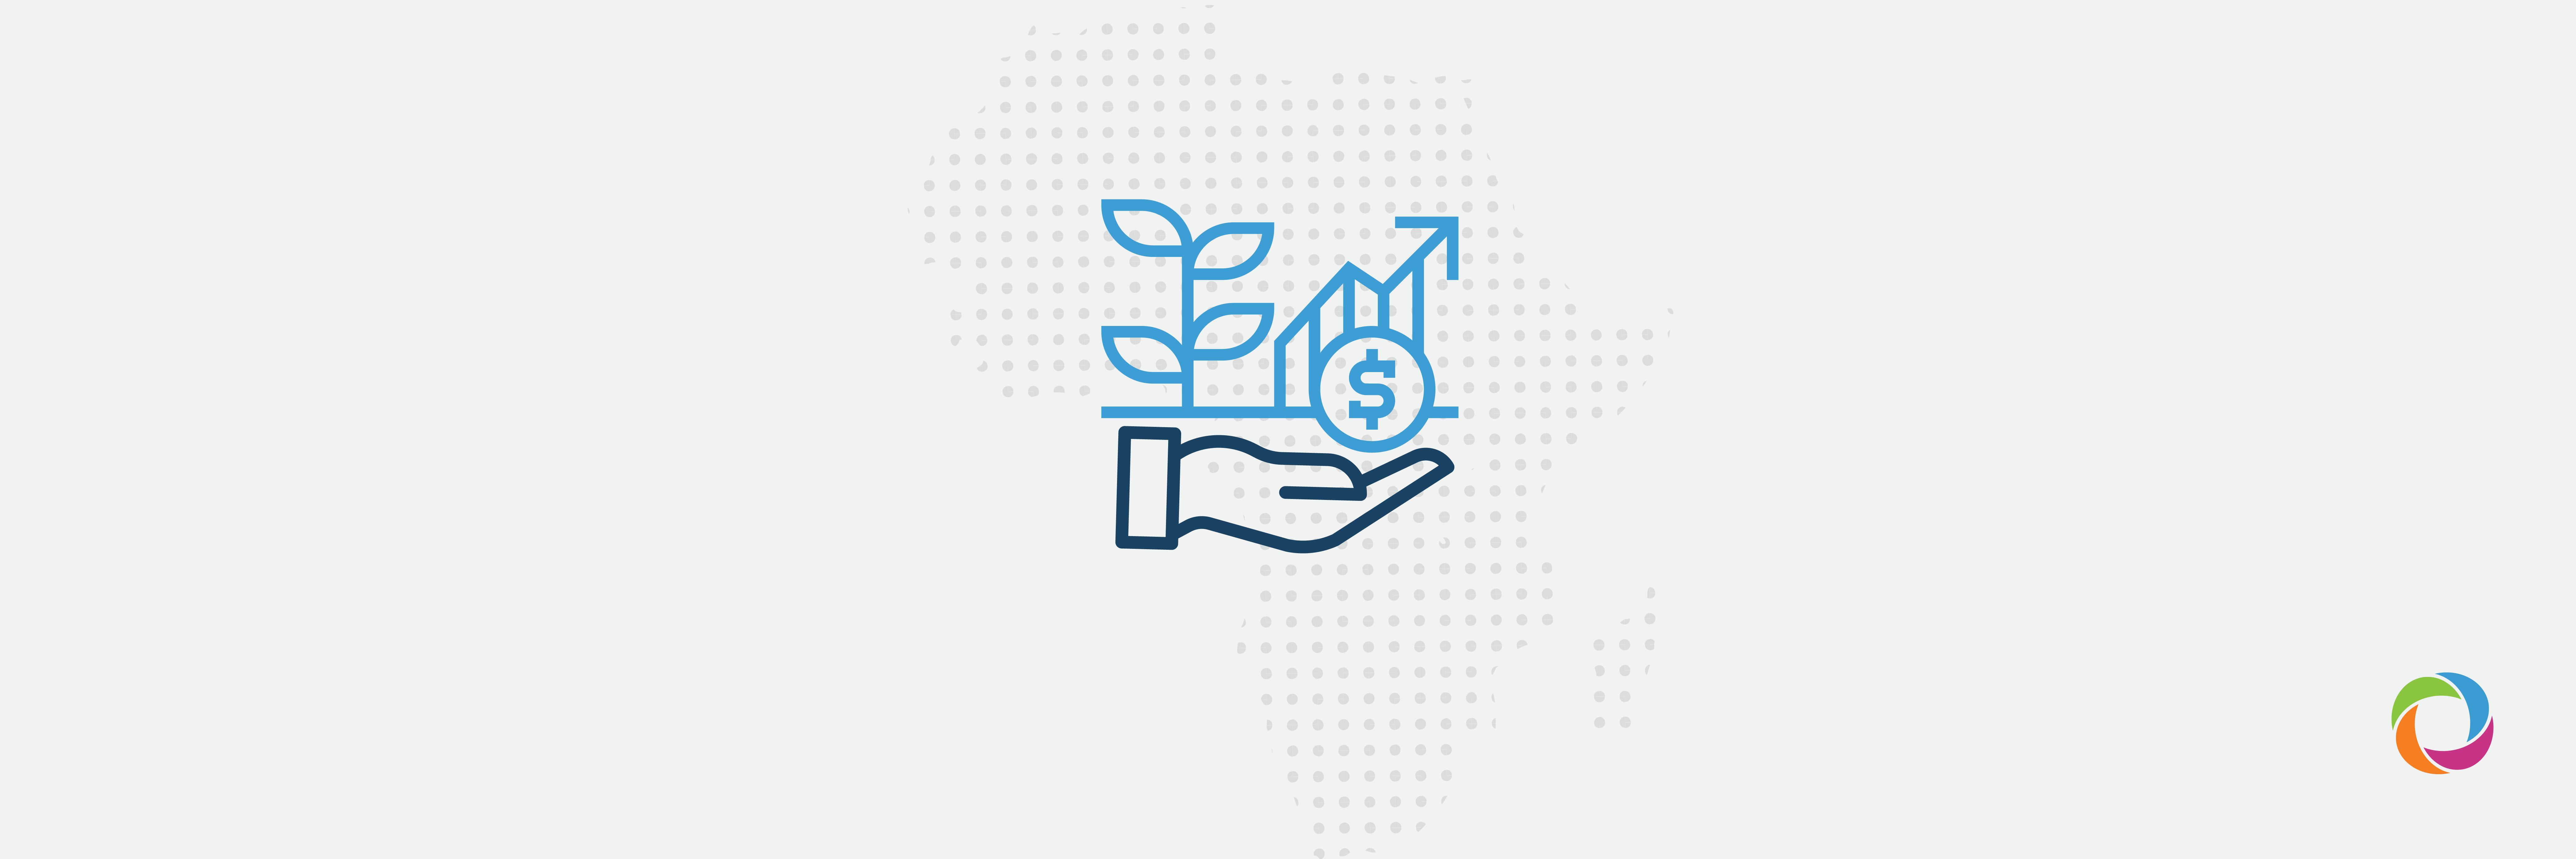 Development investment and development aid login kalendarz wydarzen ekonomicznych forex charts